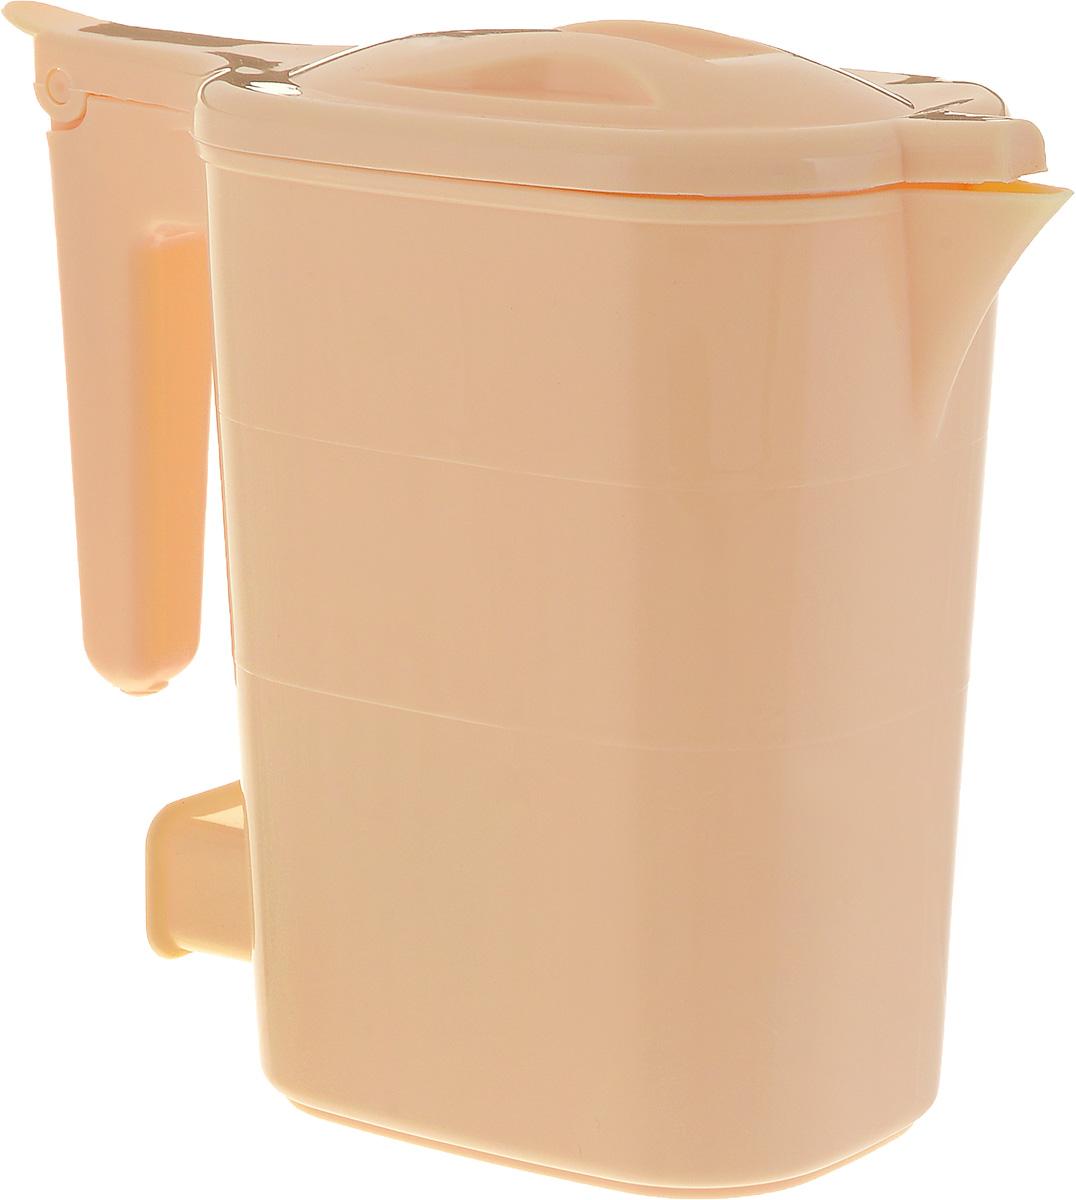 Мастерица ЭЧ 0,5/0,5-220 чайник электрический, цвет бежевый